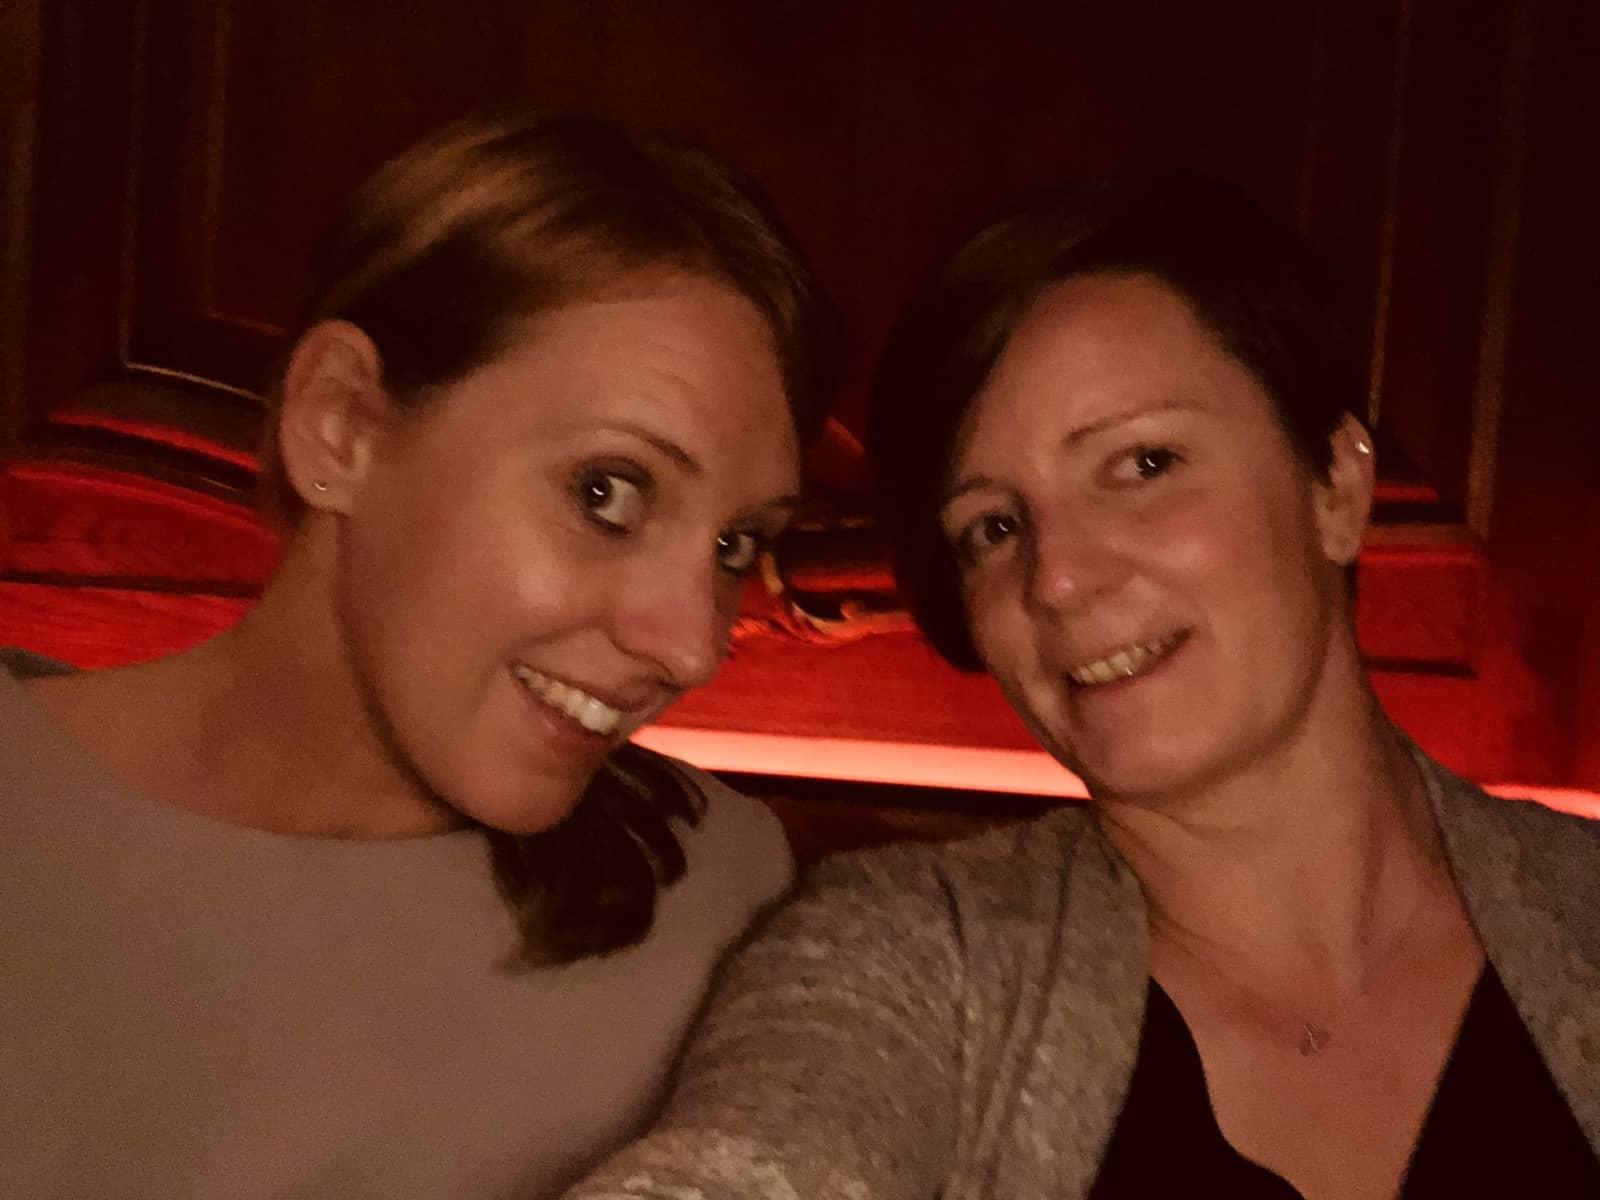 Natalie & Erin from Liverpool, United Kingdom